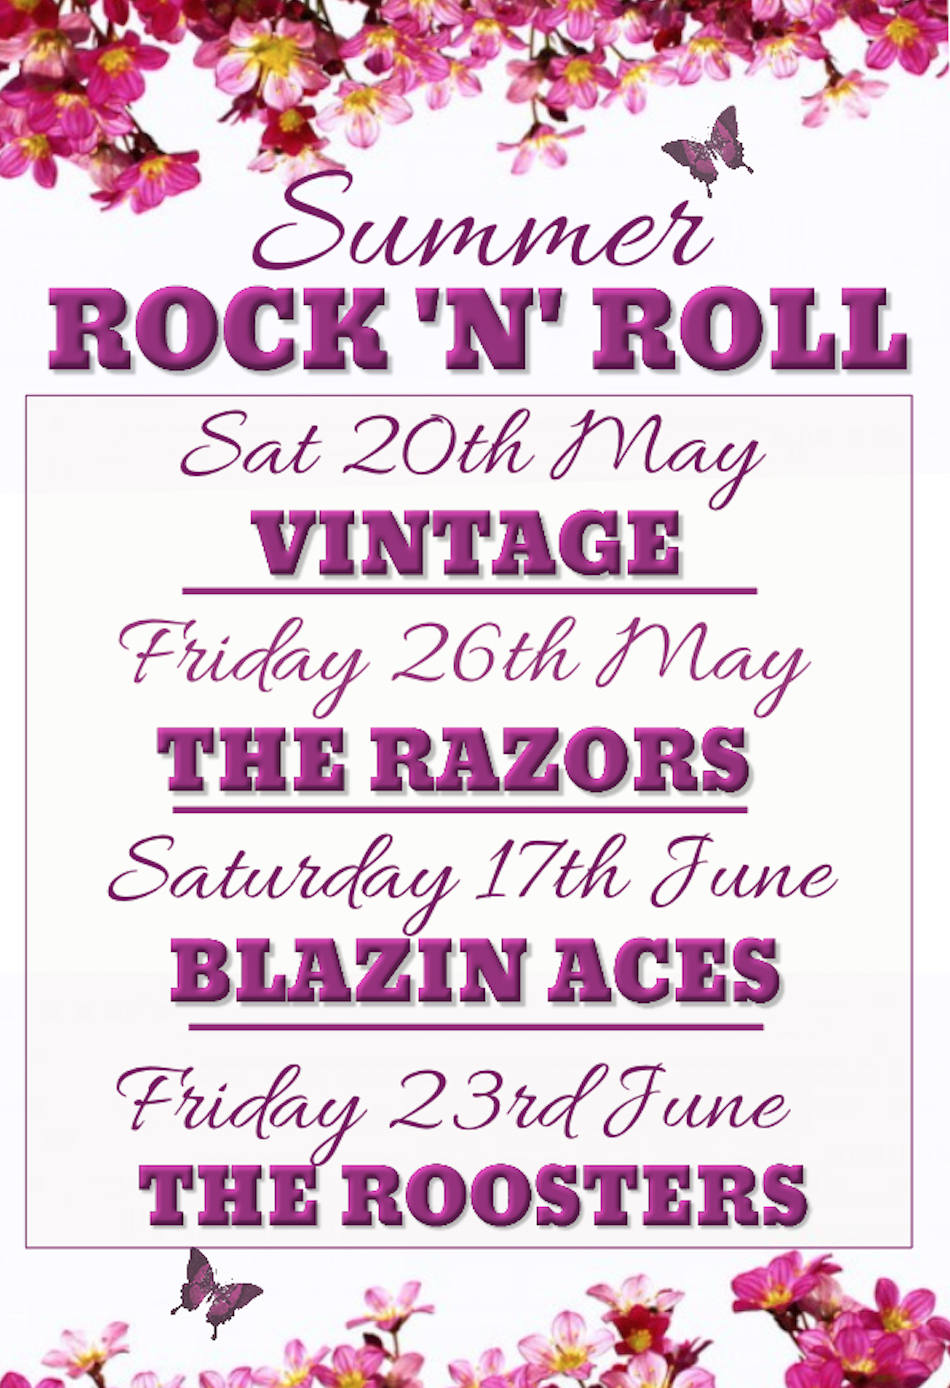 Summer Rock n Roll Poster